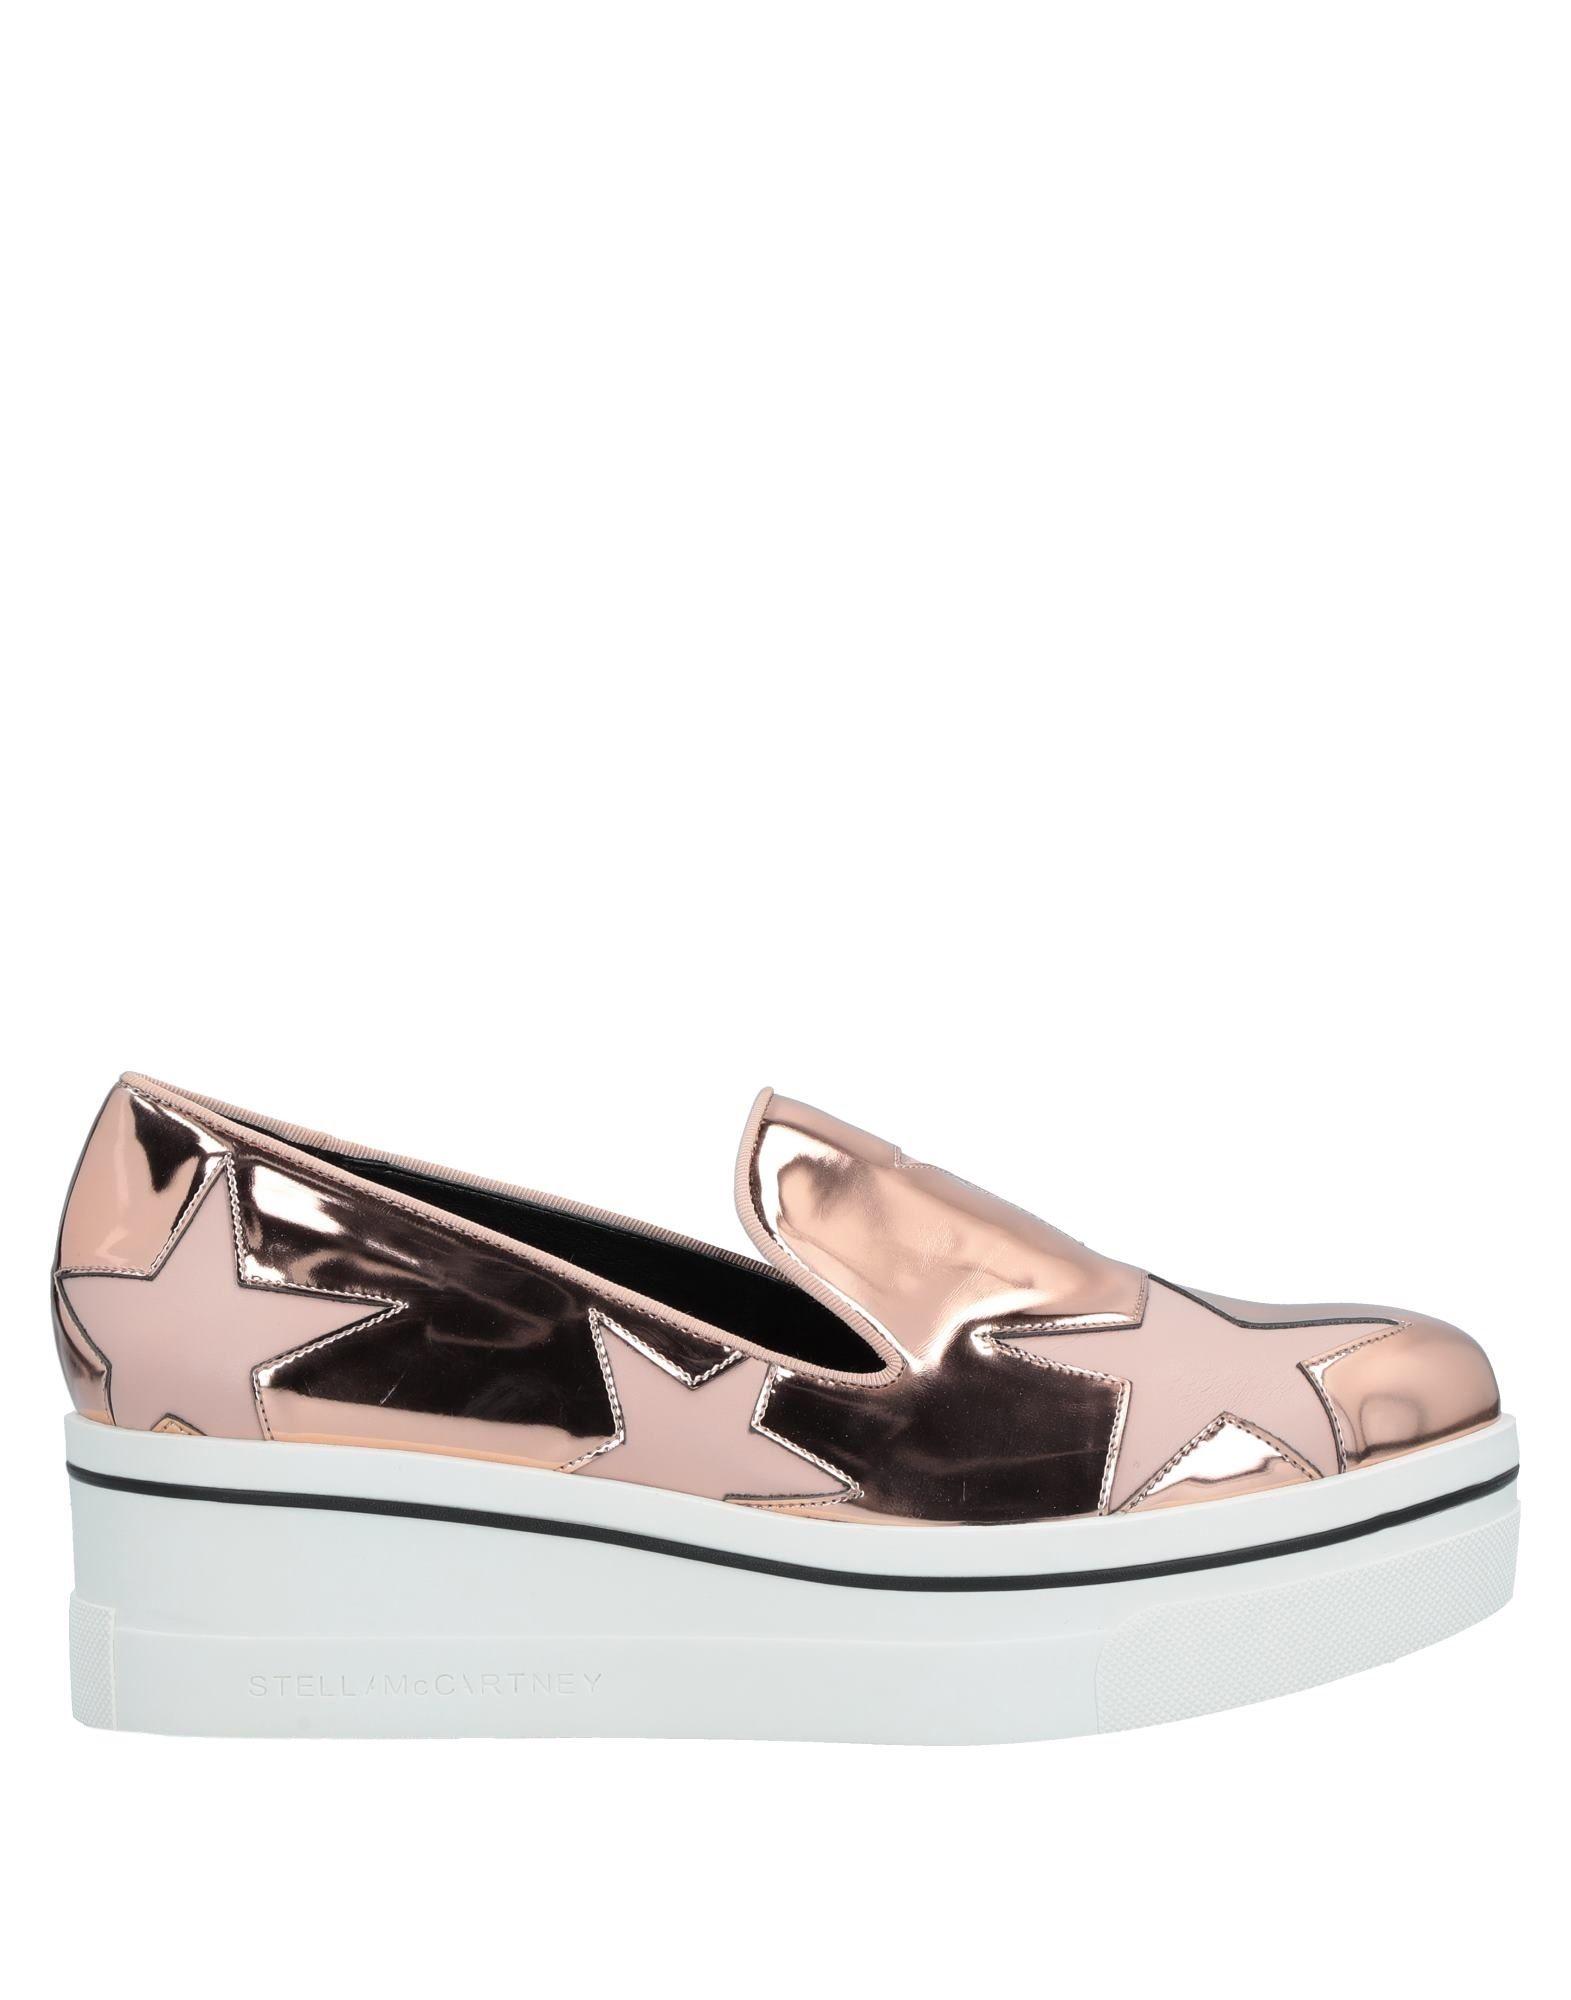 Sneakers Stella Mccartney Donna - 11329524NE